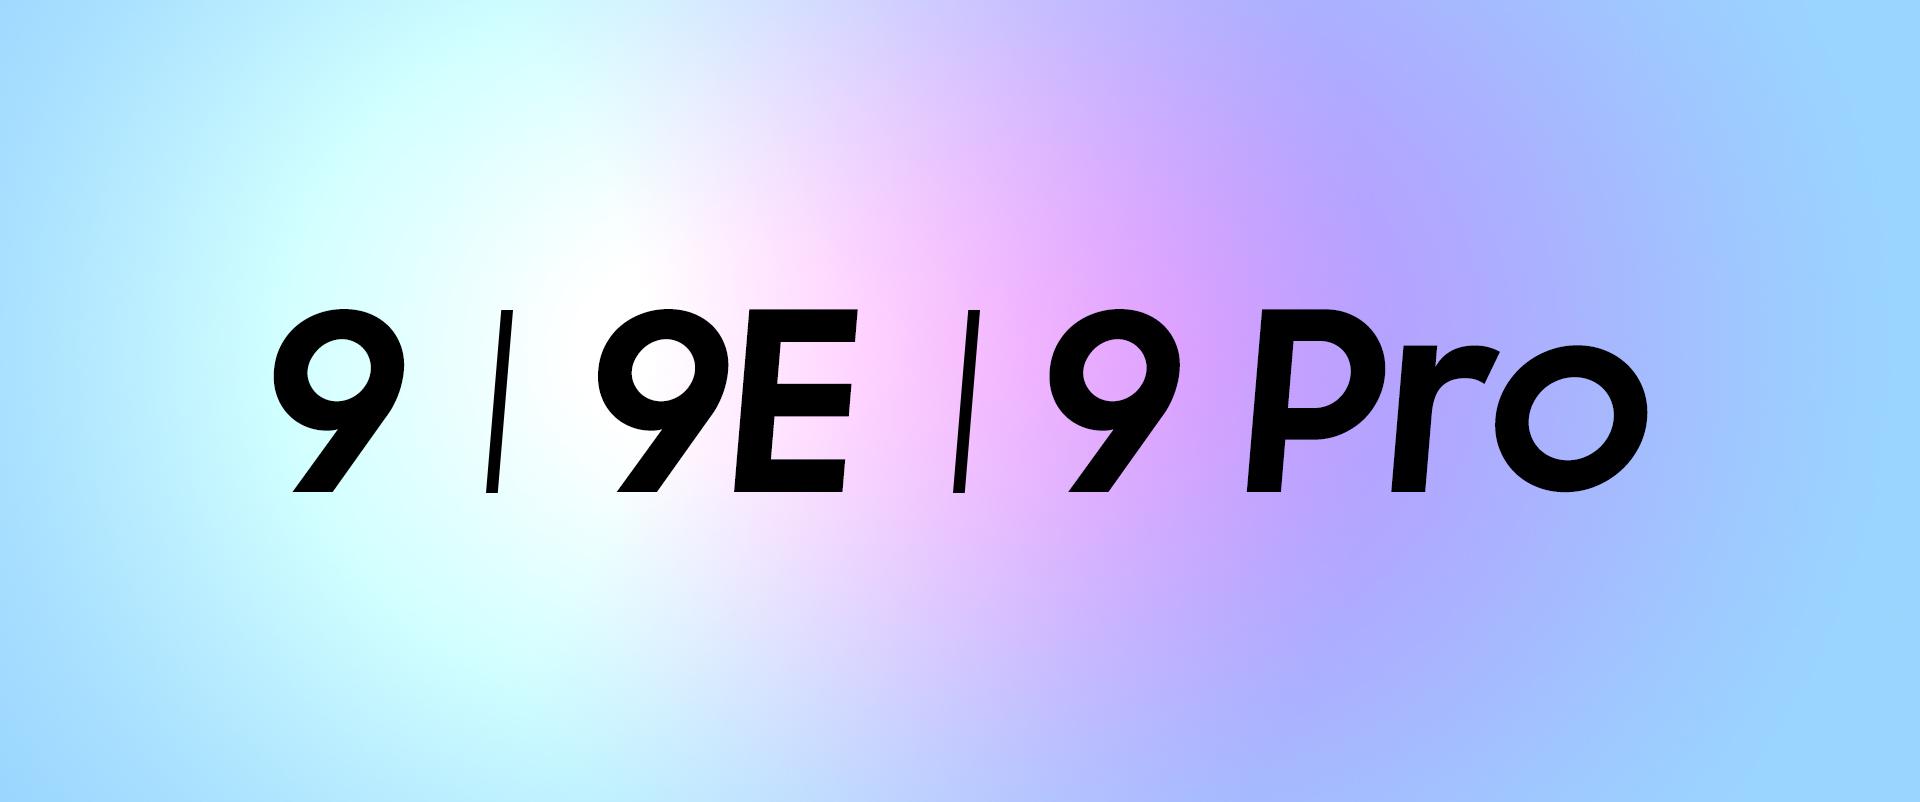 OnePlus 9E